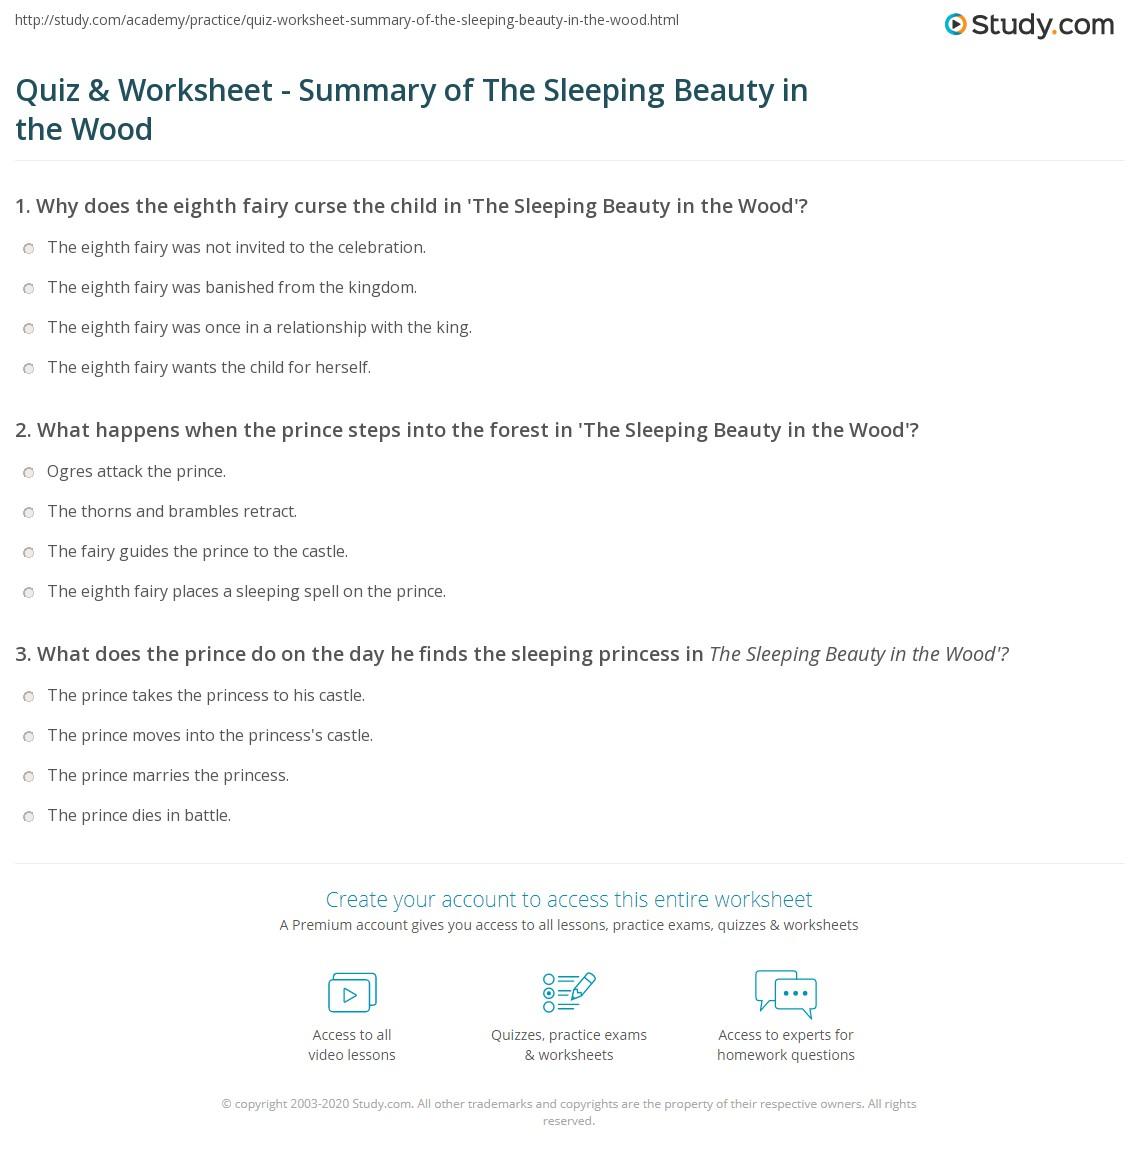 Quiz & Worksheet - Summary of The Sleeping Beauty in the Wood ...